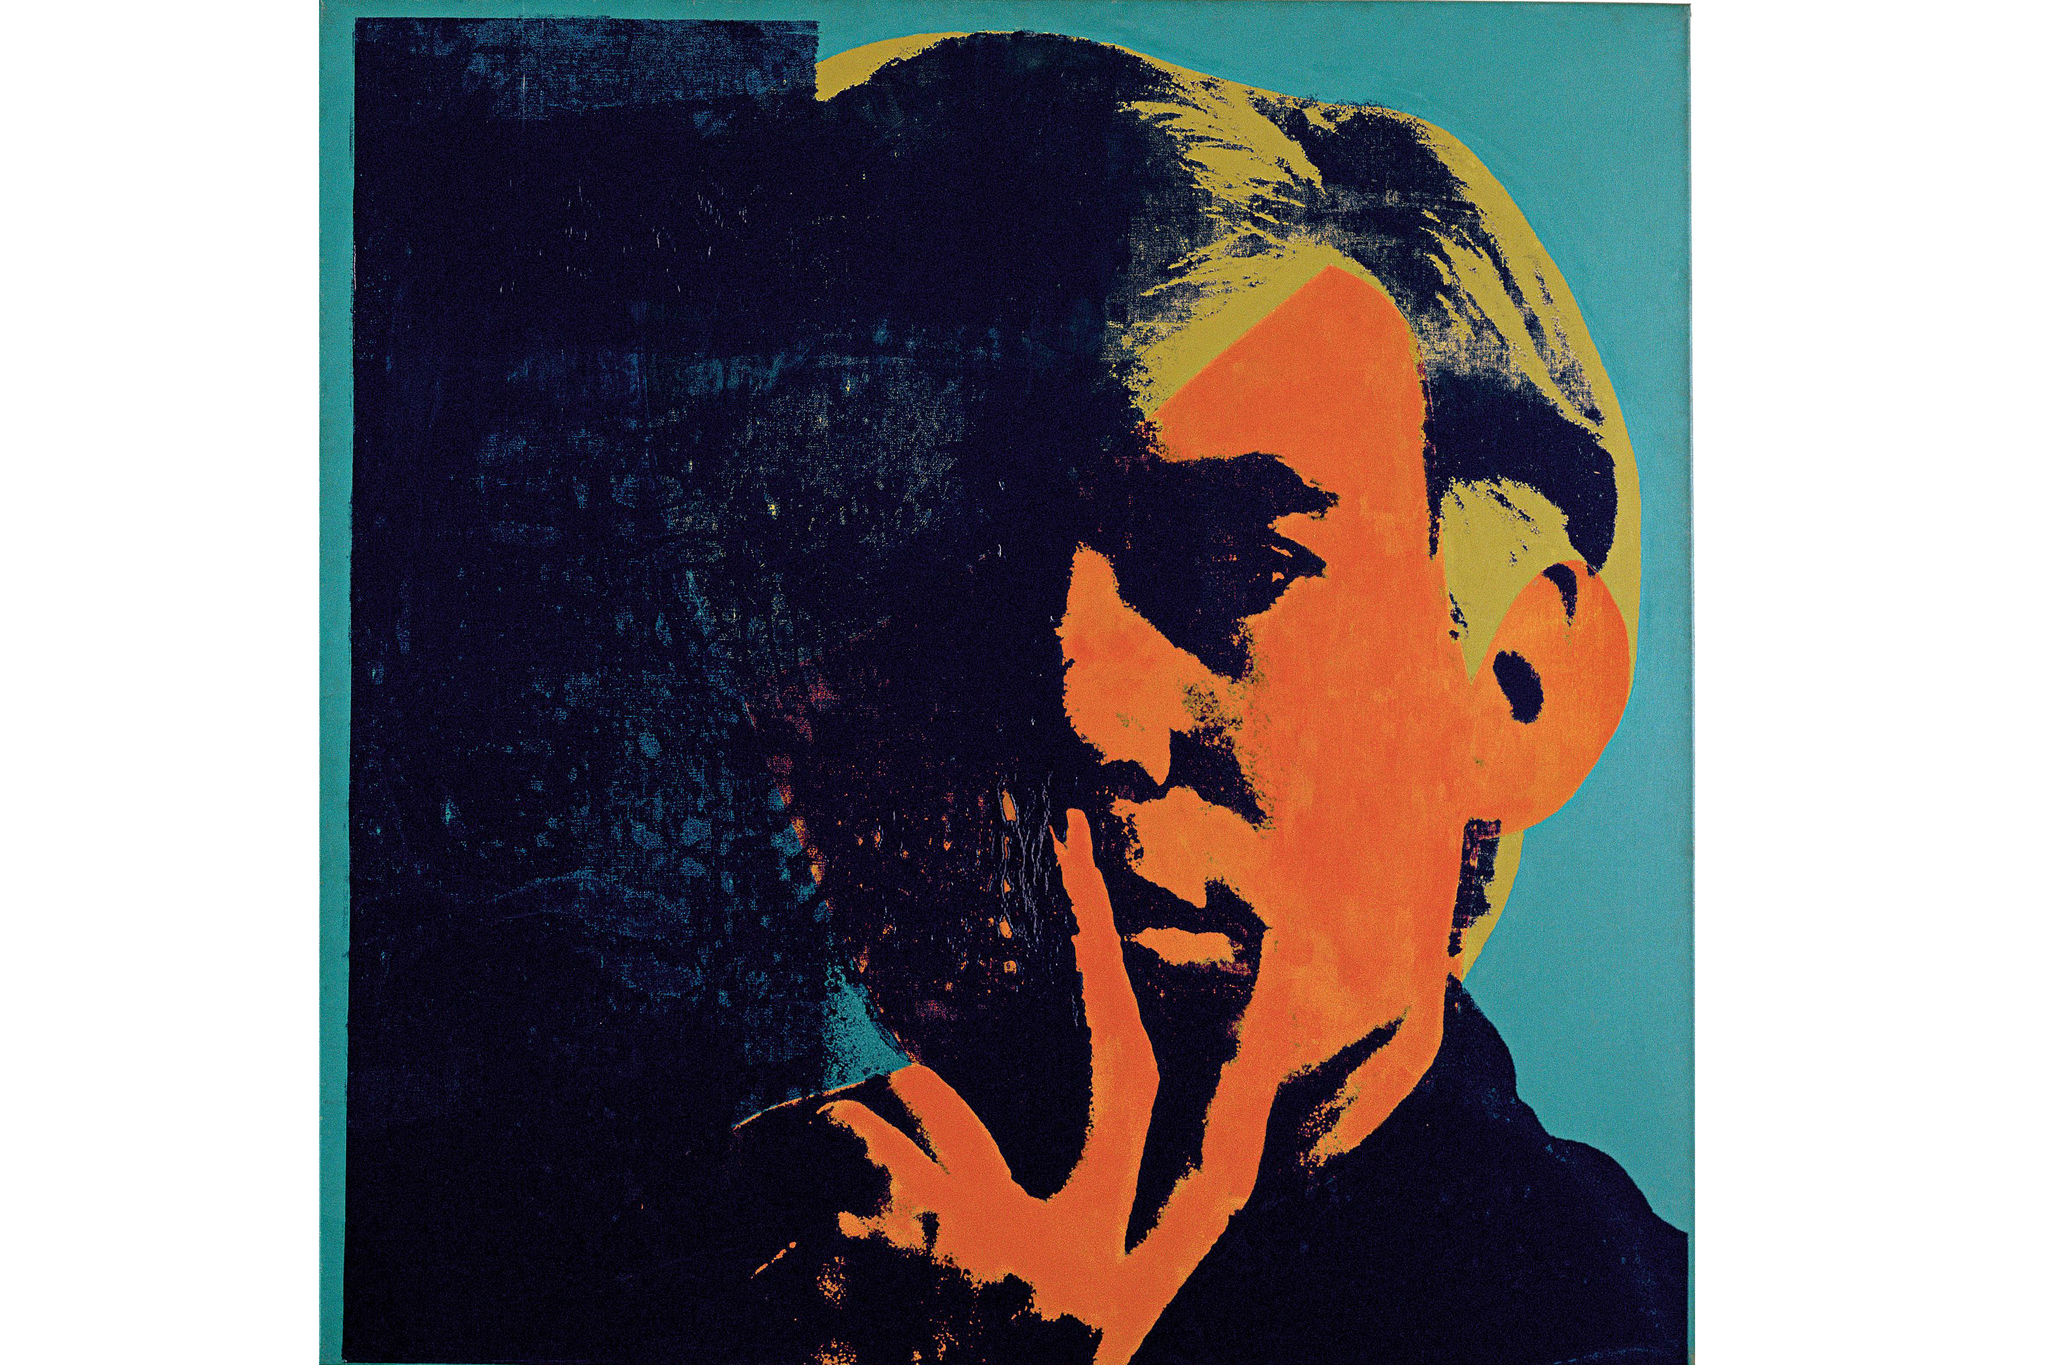 Andy Warhol, Self-Portrait, 1967